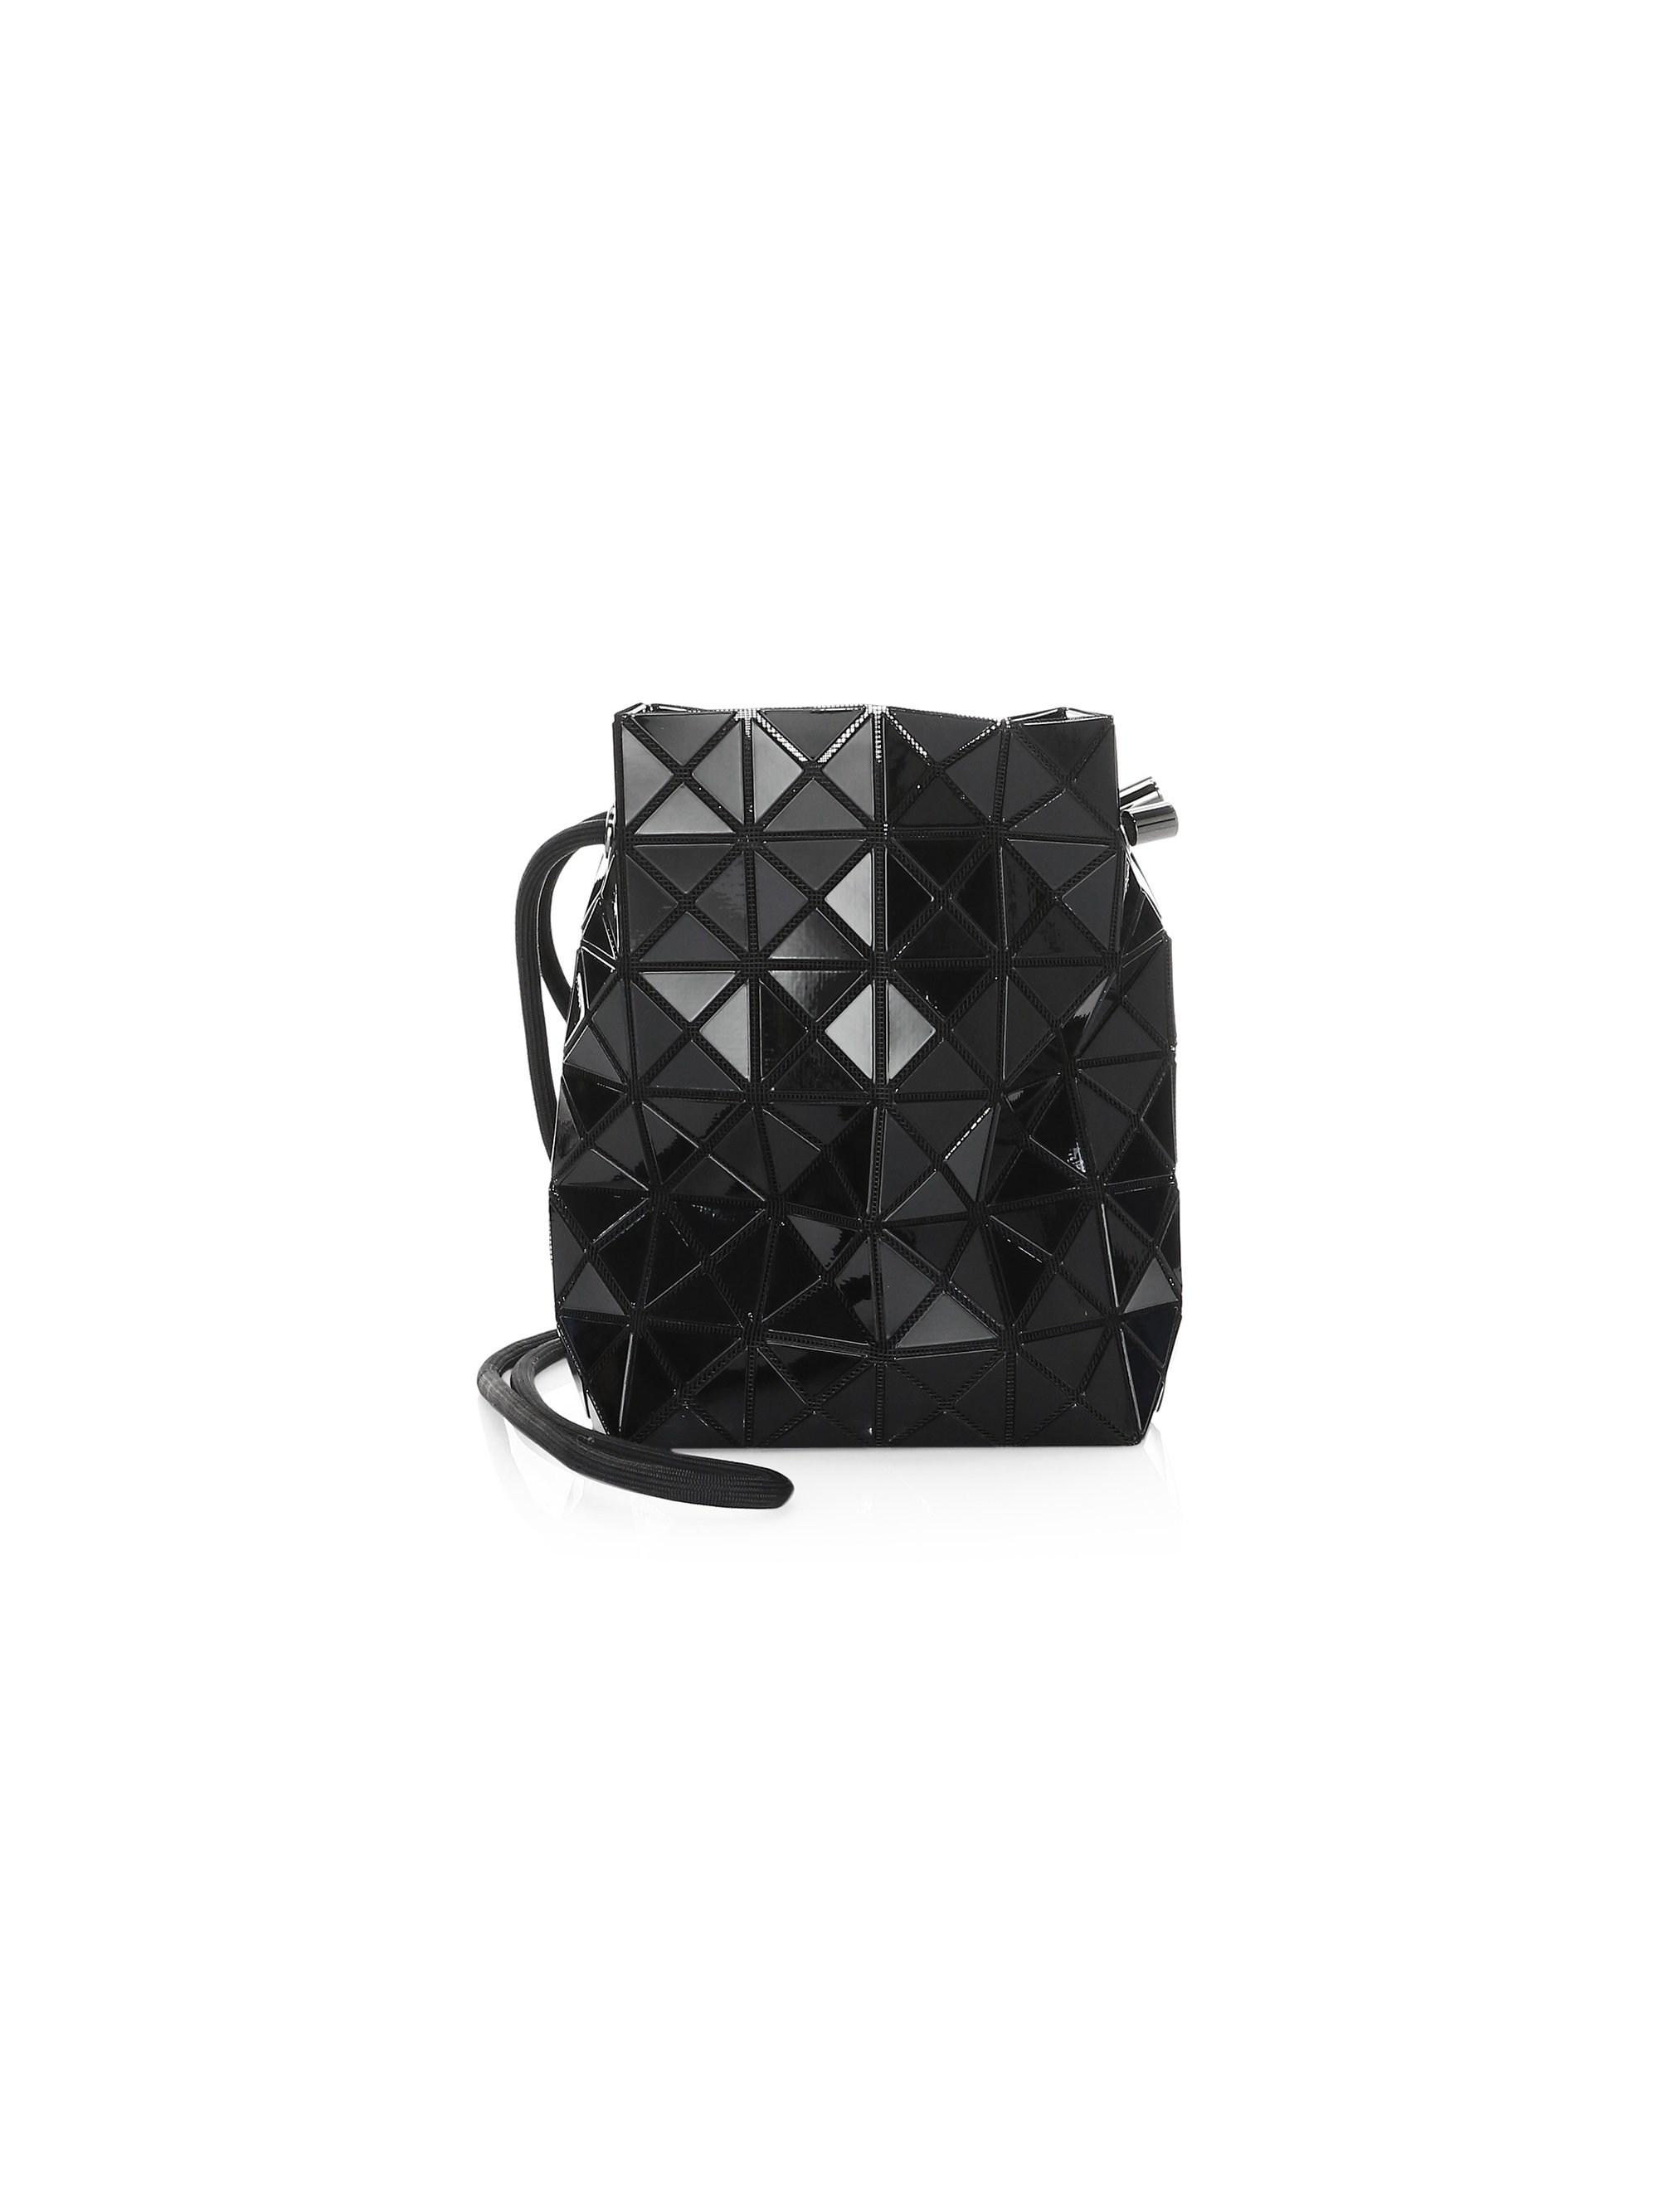 Lyst - Bao Bao Issey Miyake Women s Wring Bucket Bag - Black in Black 505833be57afc